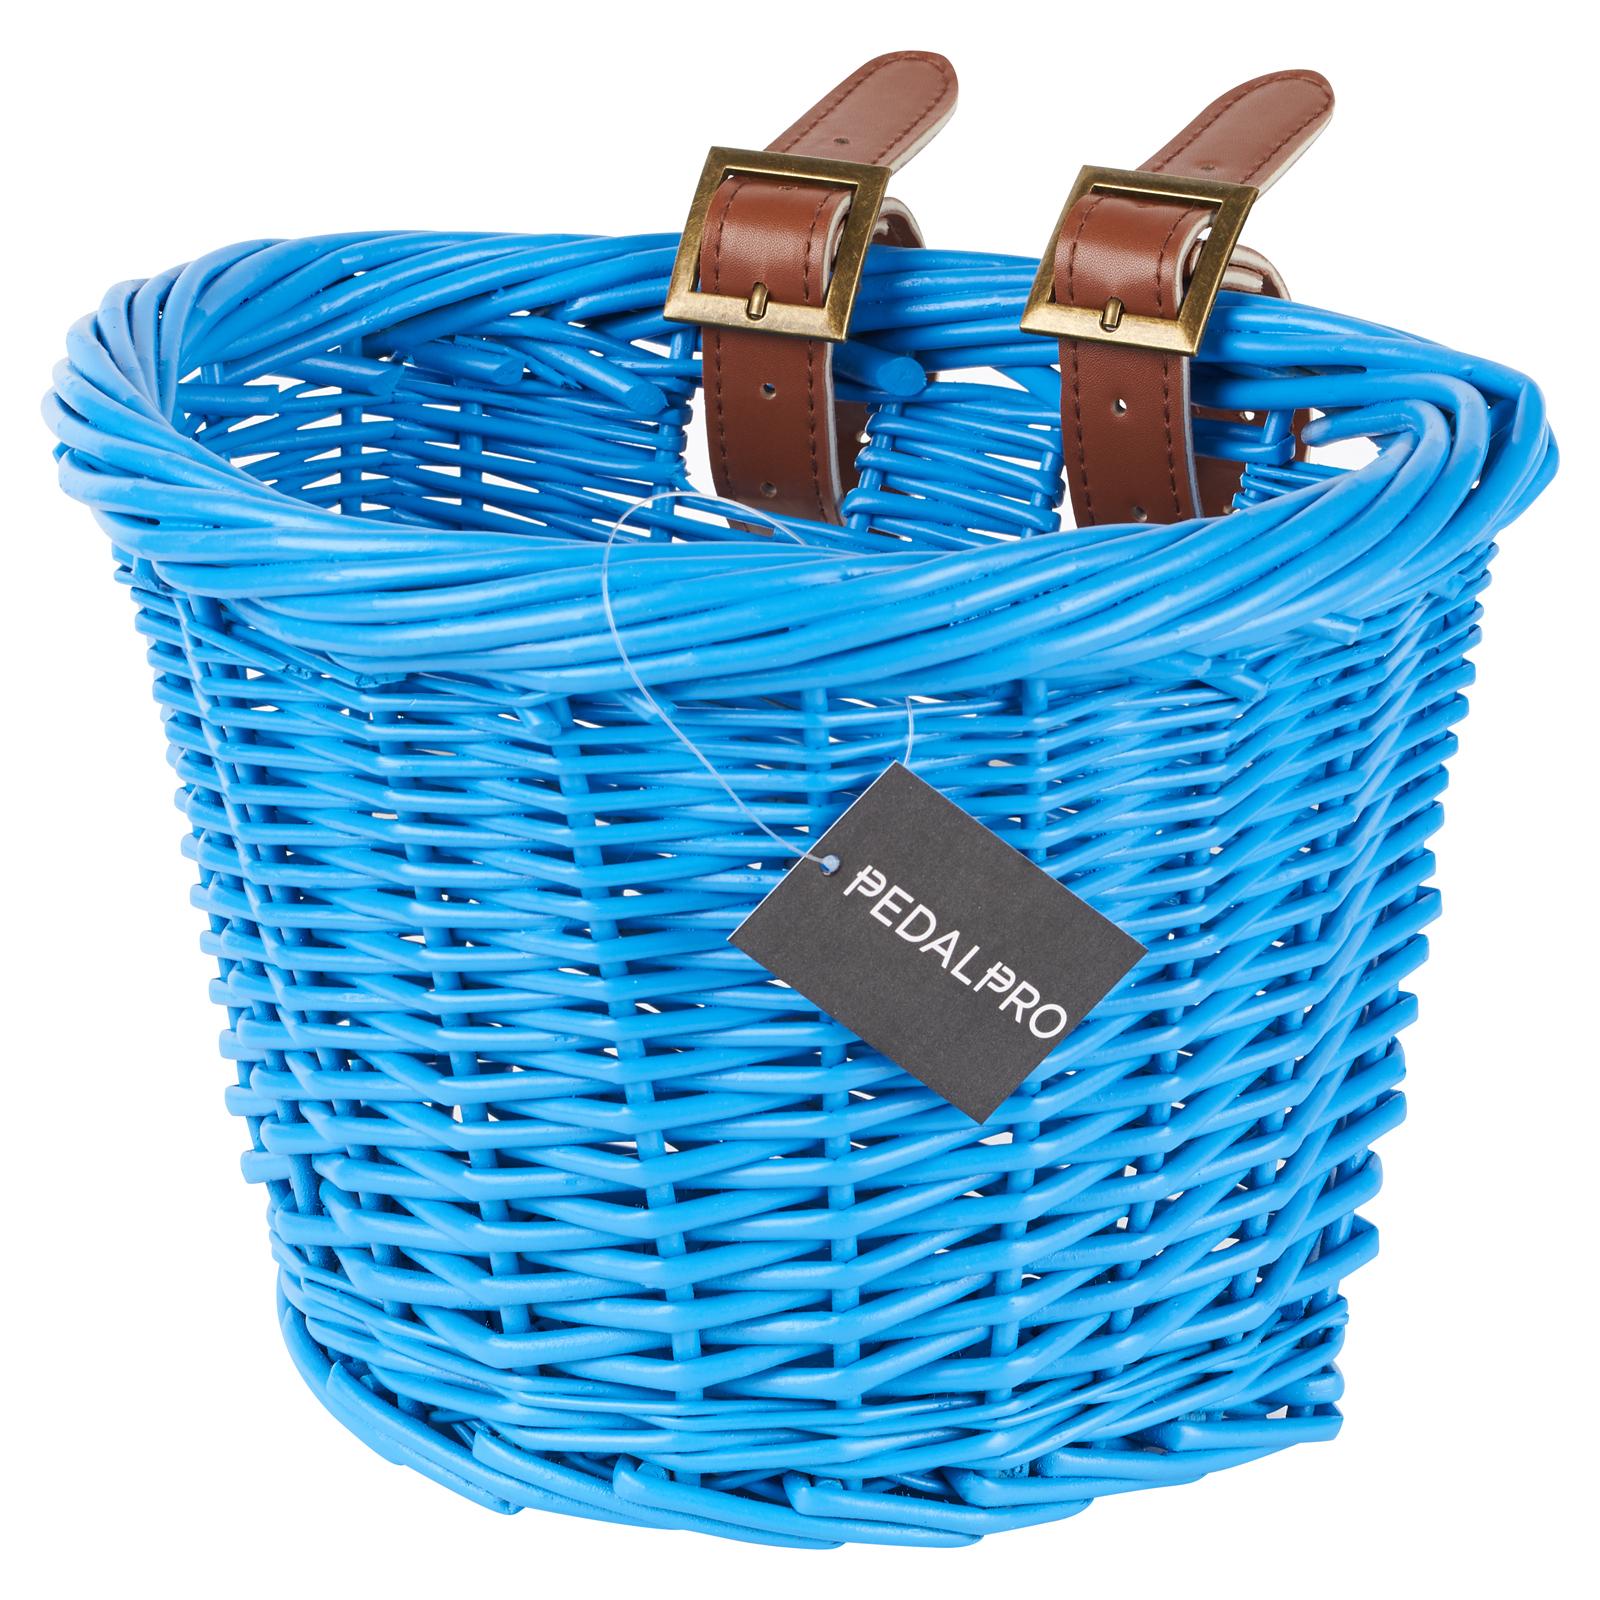 Children Bicycle Basket Retro Wicker Bicycle Shopping Basket For Boys Girls Bike